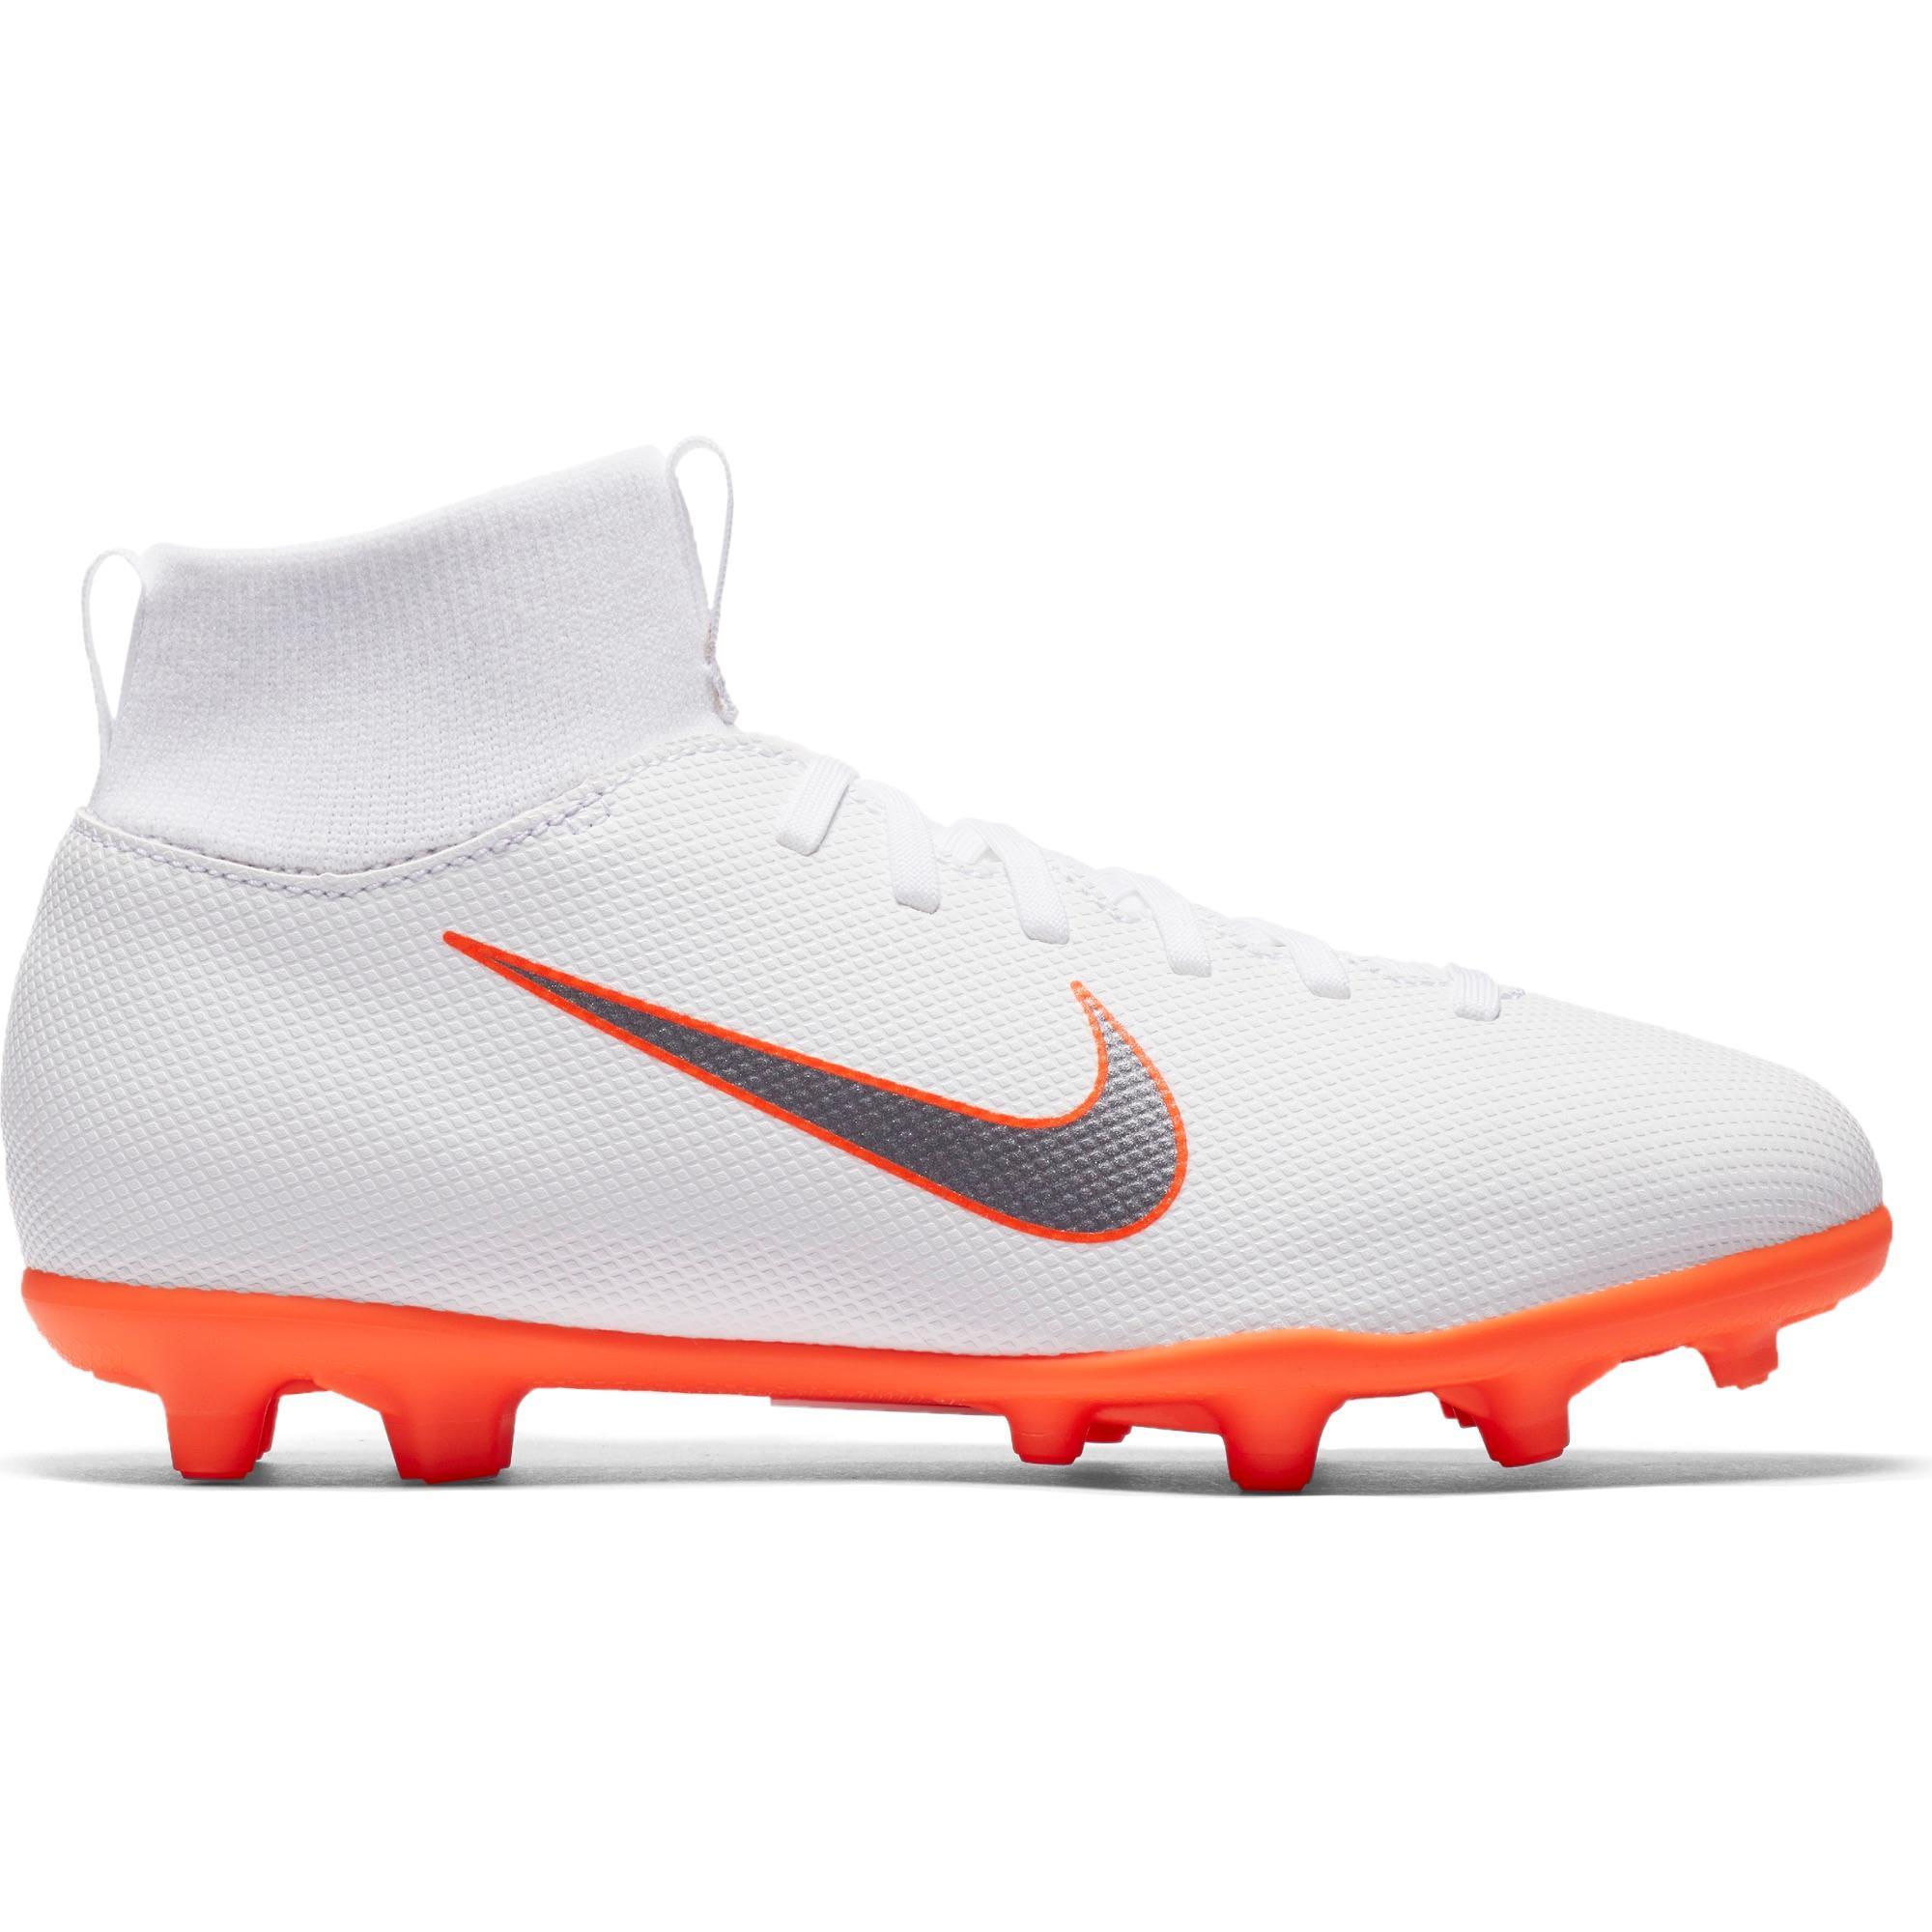 9746a550e02 Botas de Fútbol Nike Mercurial Superfly VI Club MG niños blanco